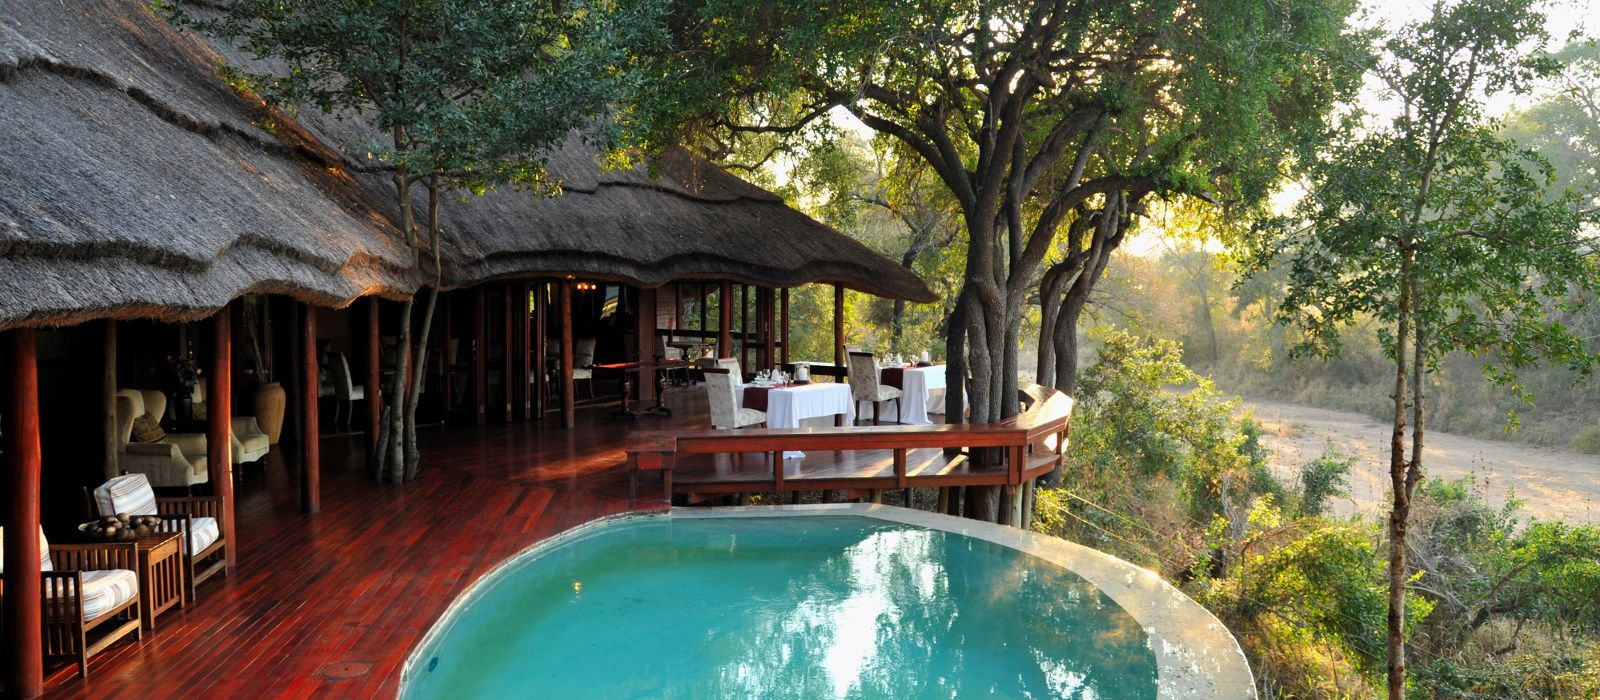 Imbali Safari Lodge Hotel In South Africa Enchanting Travels